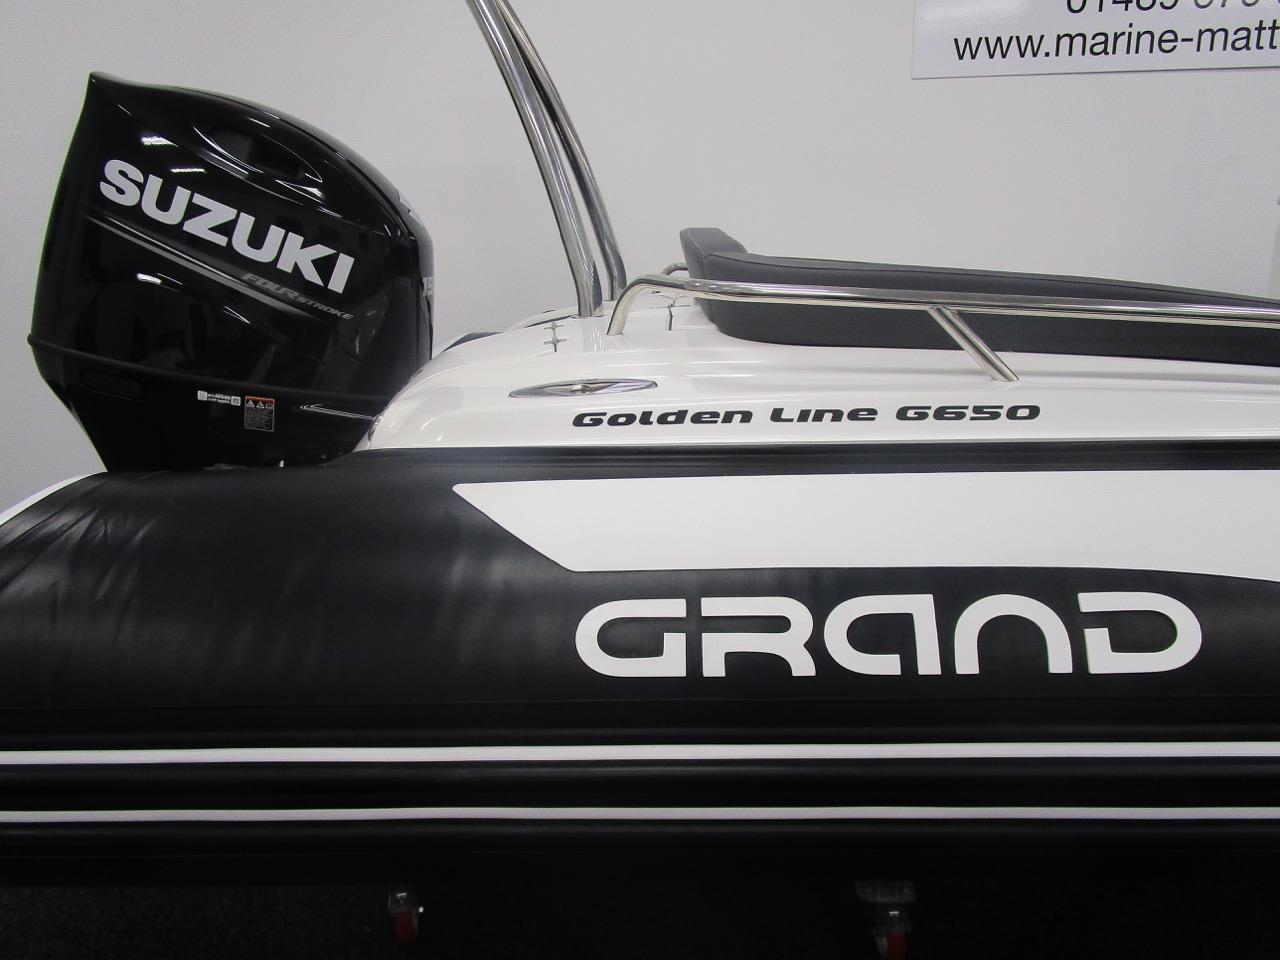 Grand RIB Golden Line G650 decals